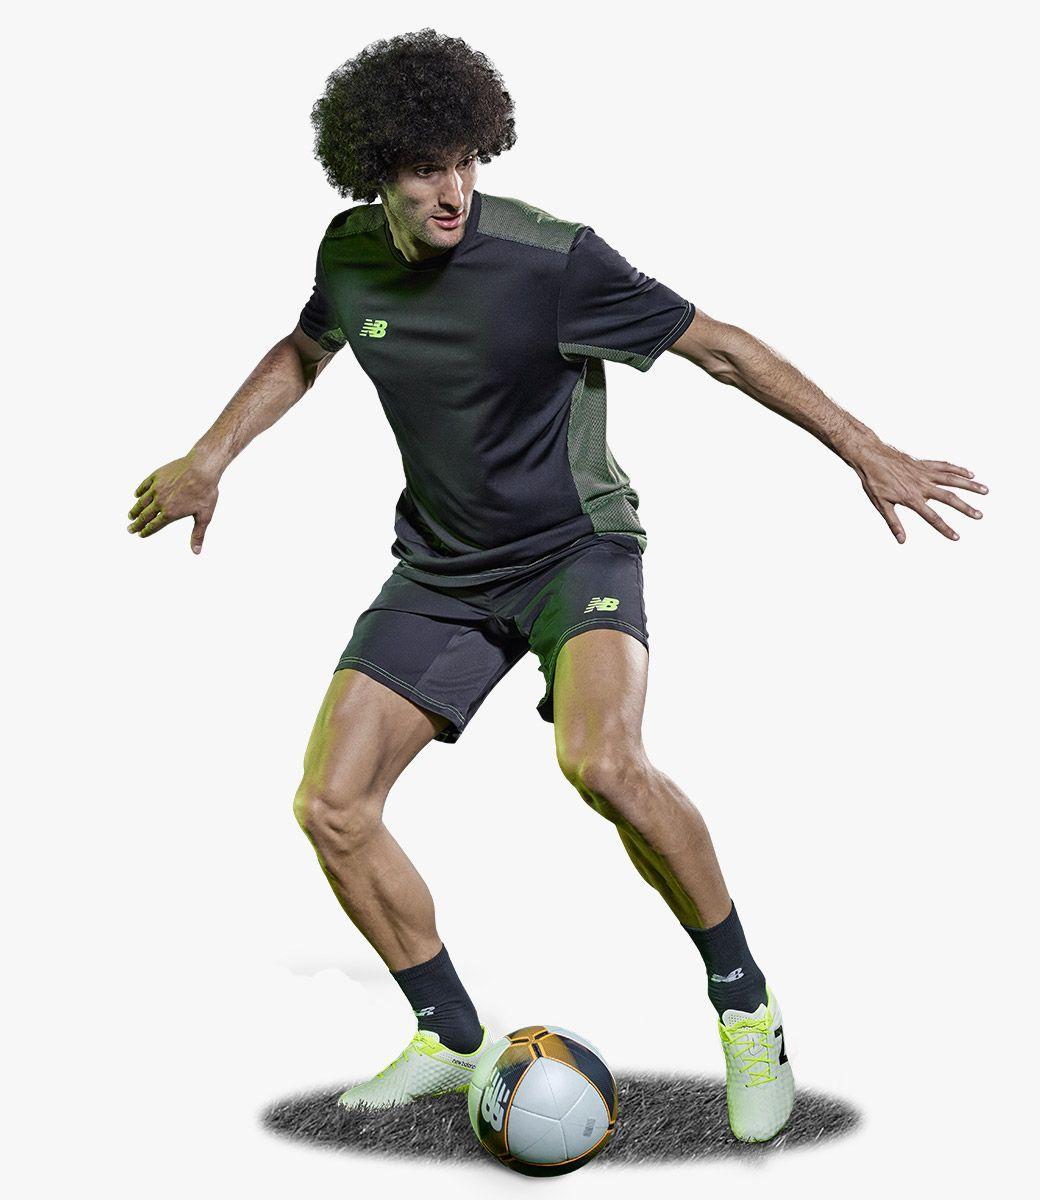 New Balance Mens Soccer Hub Play Hard Look,